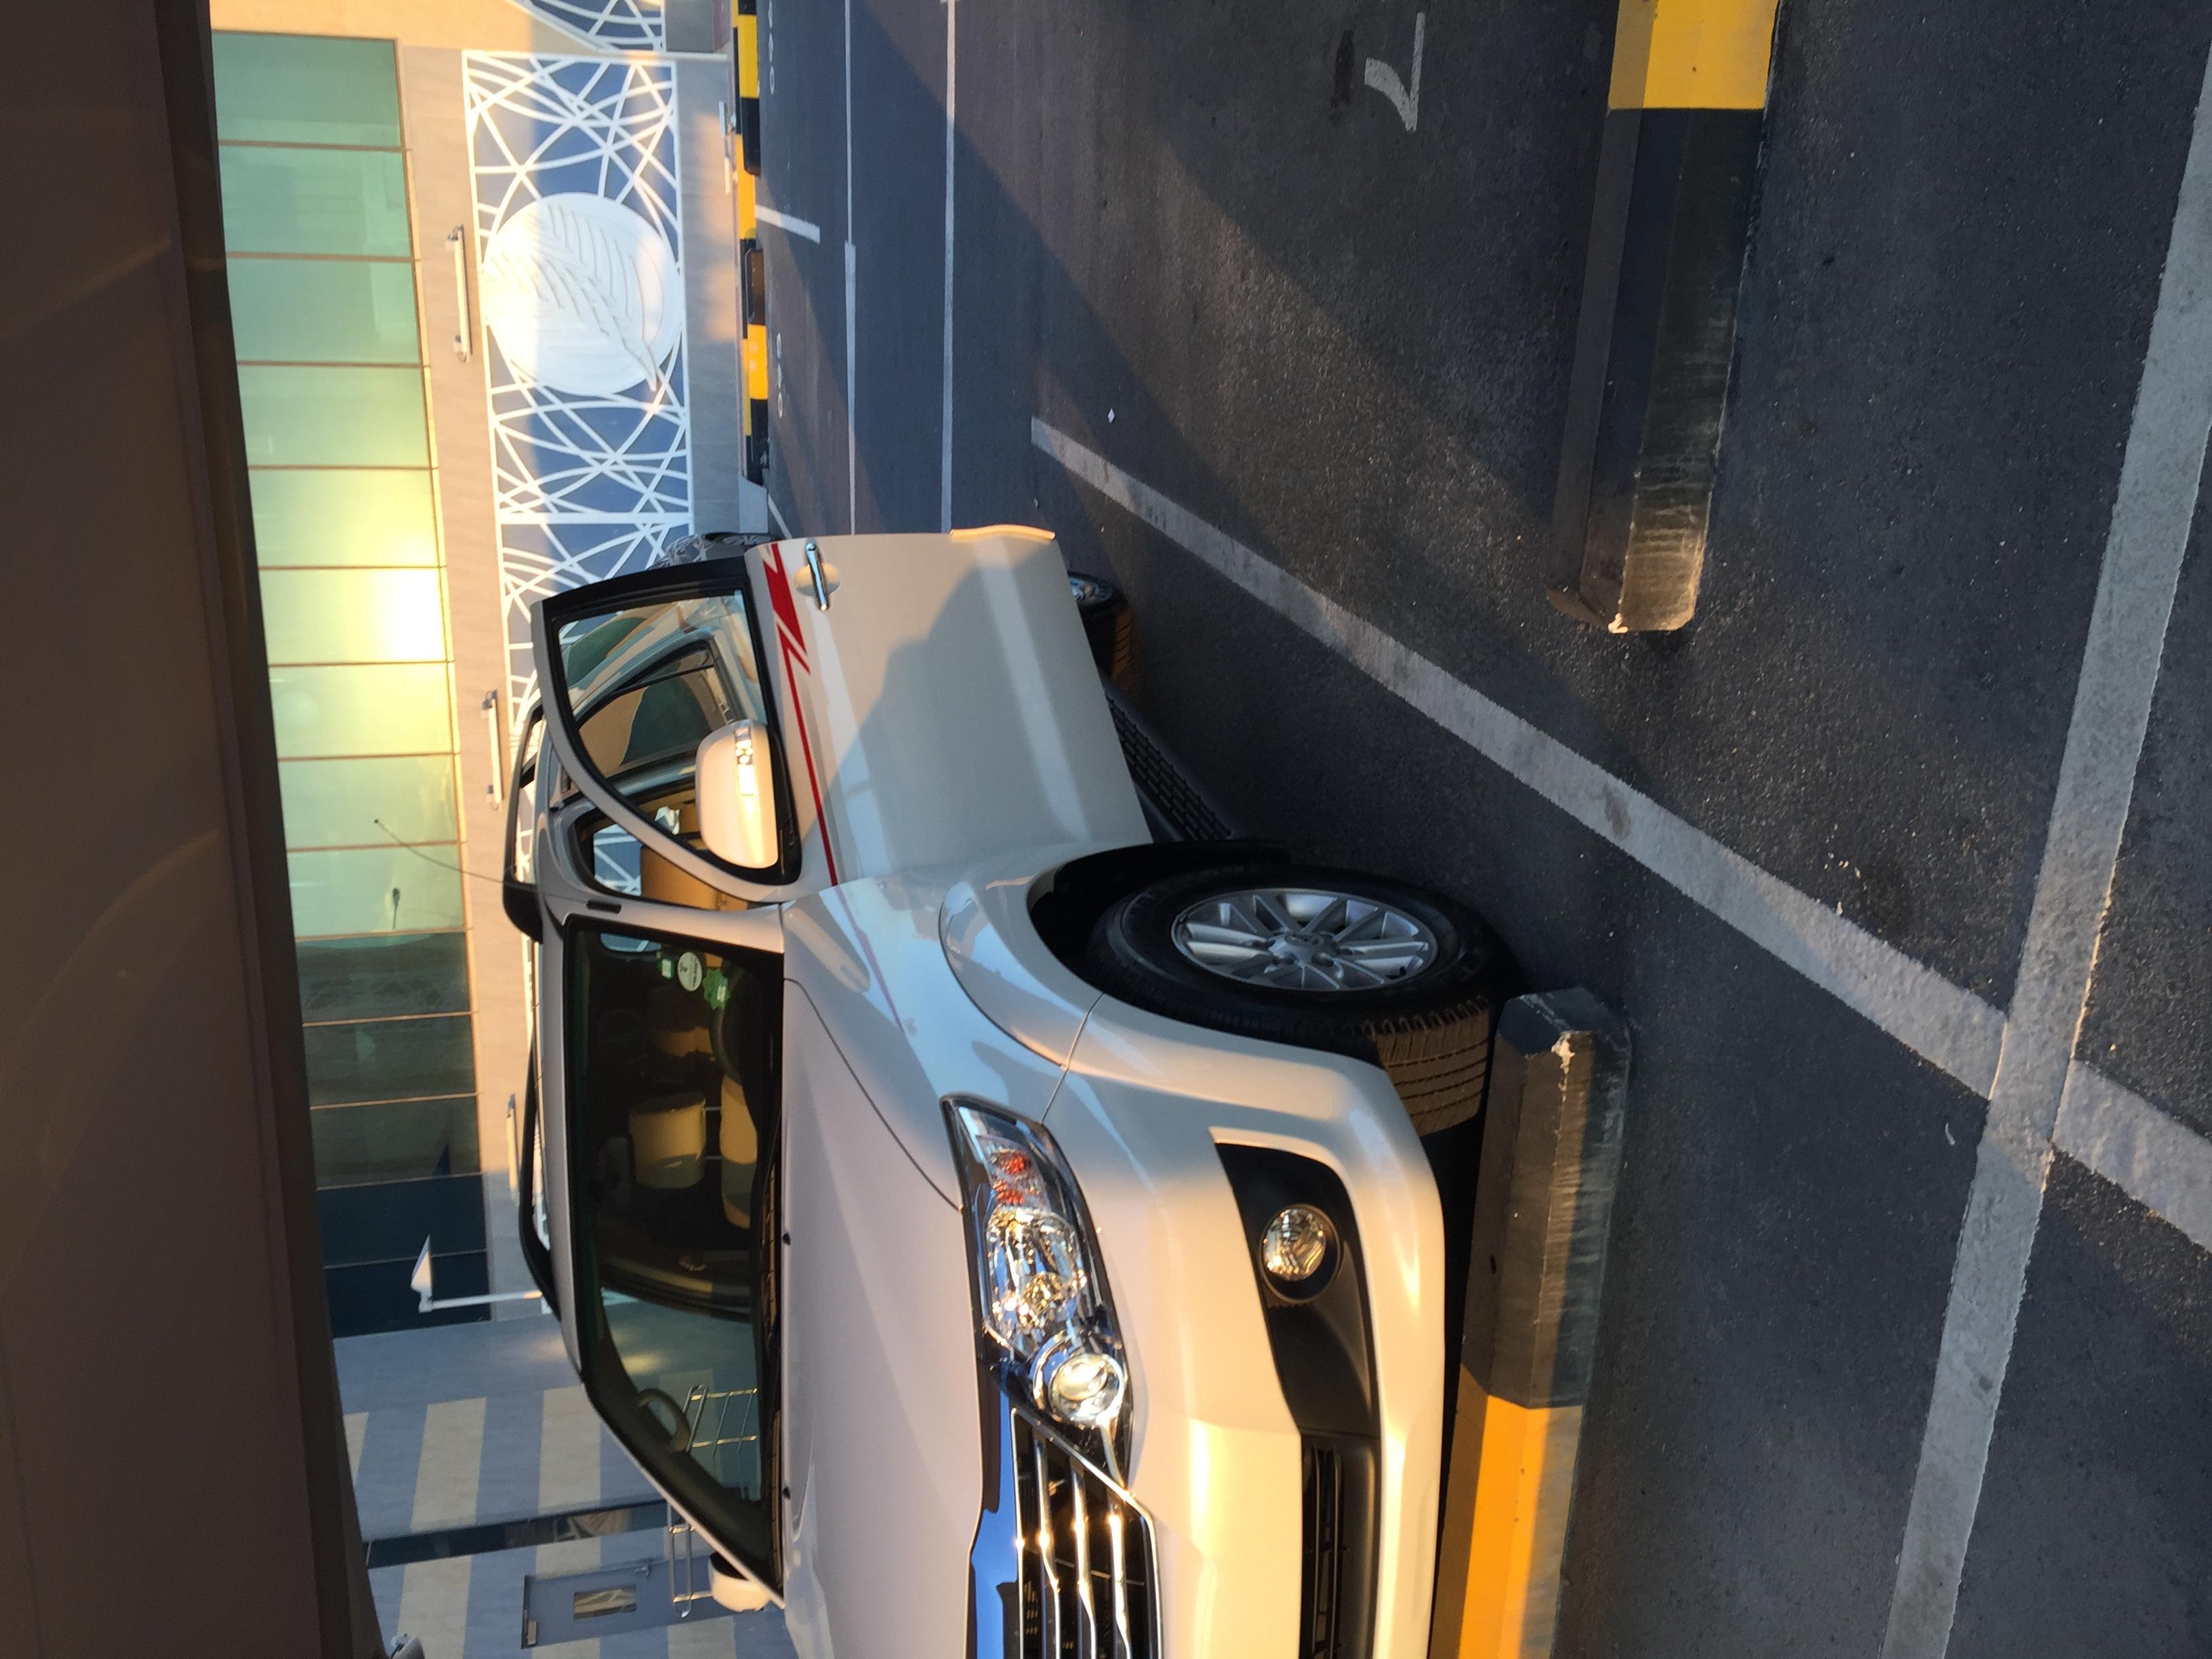 Toyota Fortuner 2014 - V6 - URGENT SALE!!!!- reduc